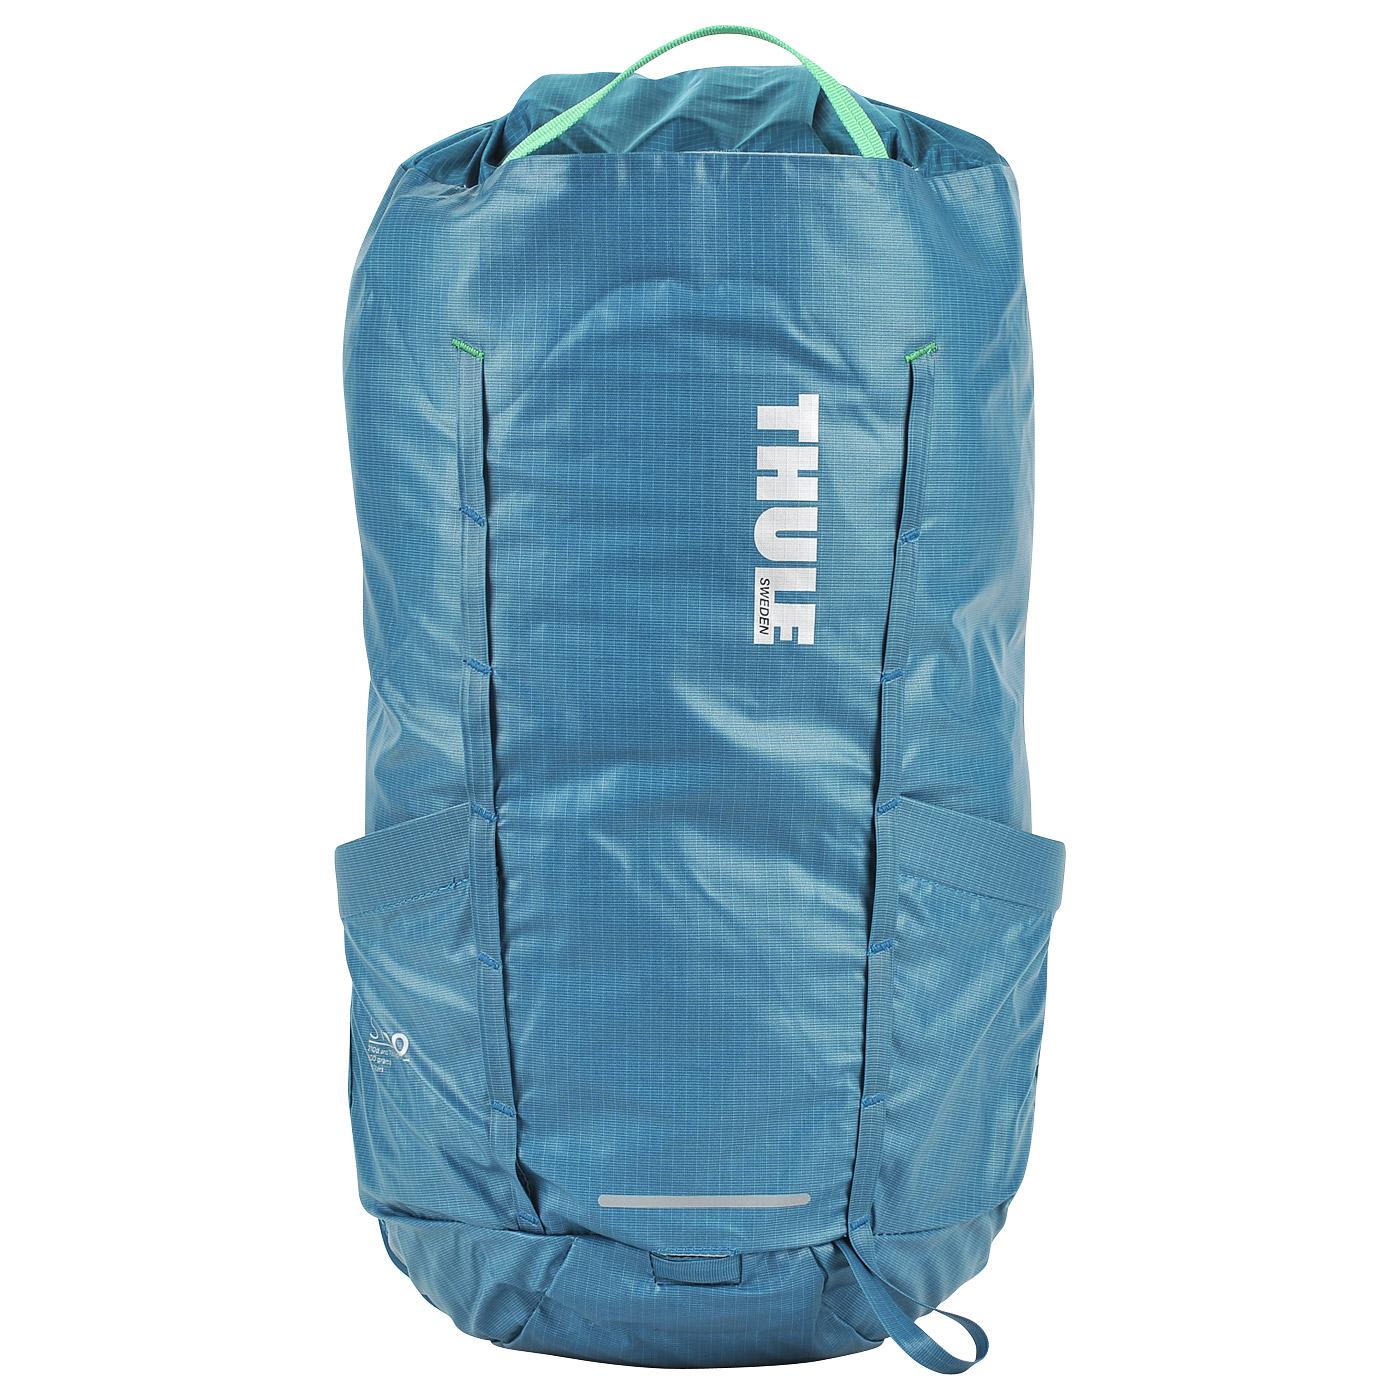 Рюкзак Thule Stir голубой 20 л